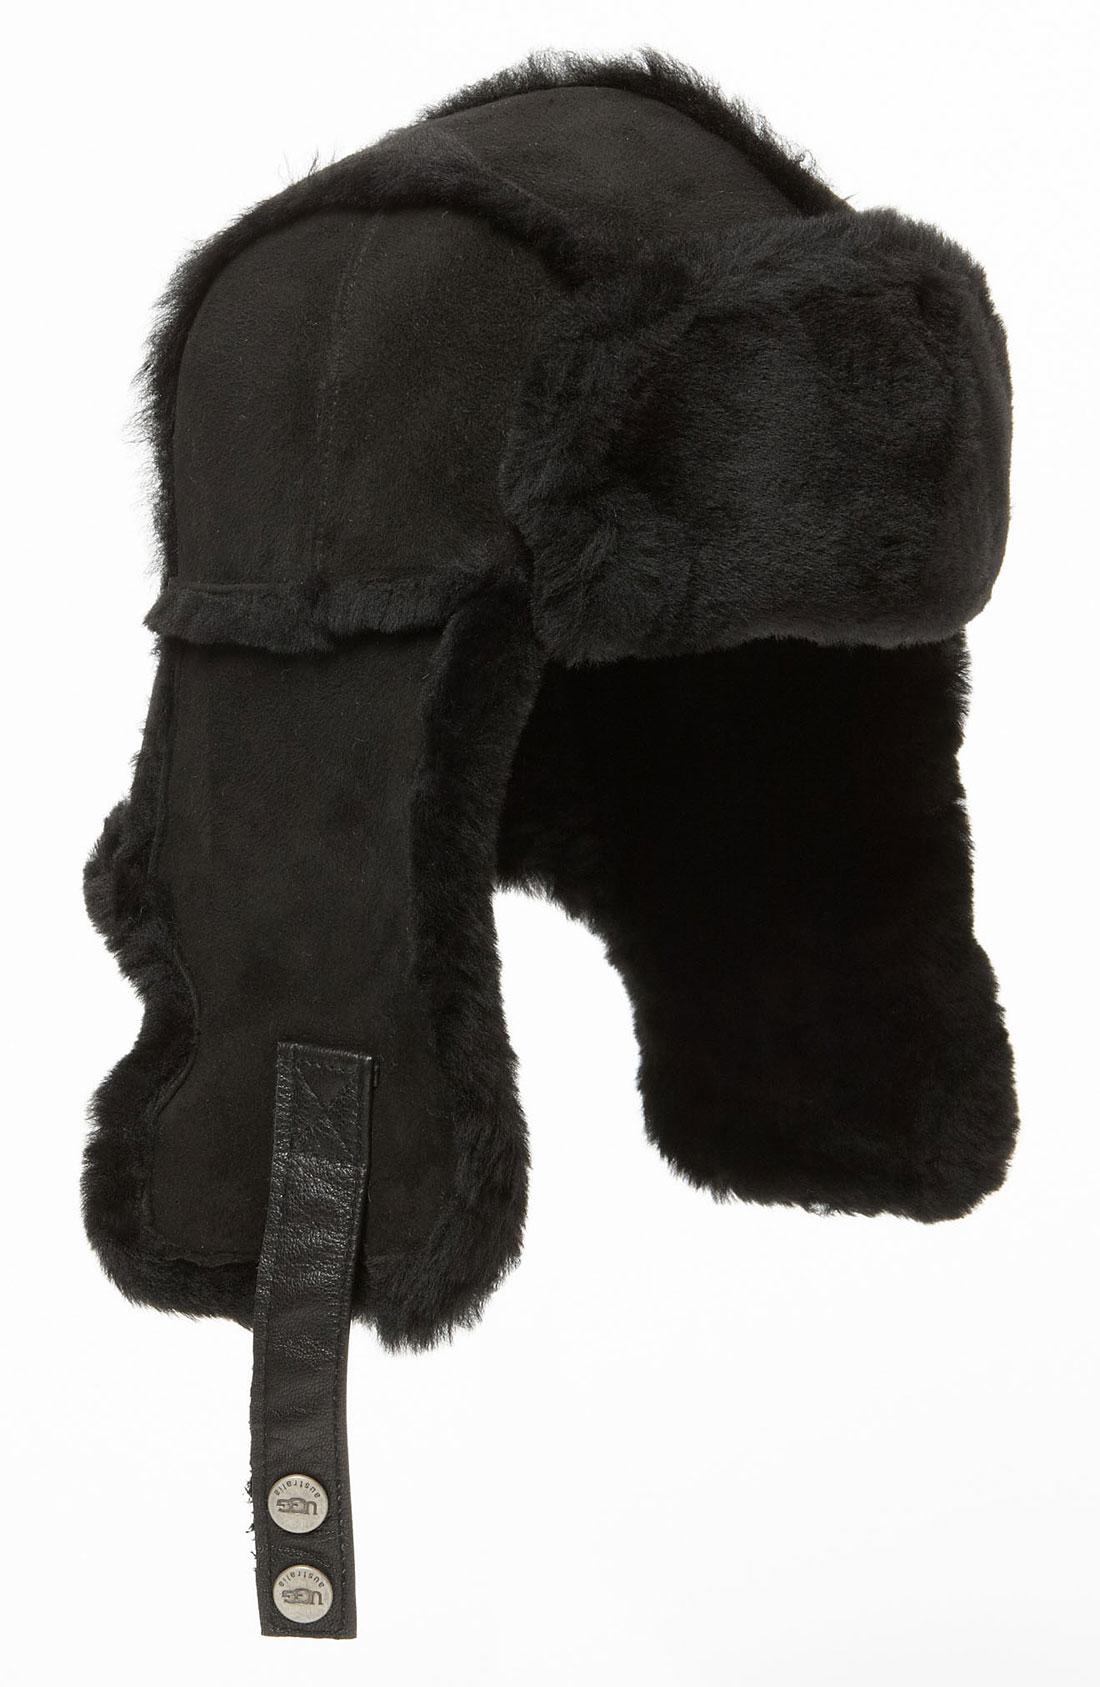 2422de72431b1 Ugg Trapper Hat Black